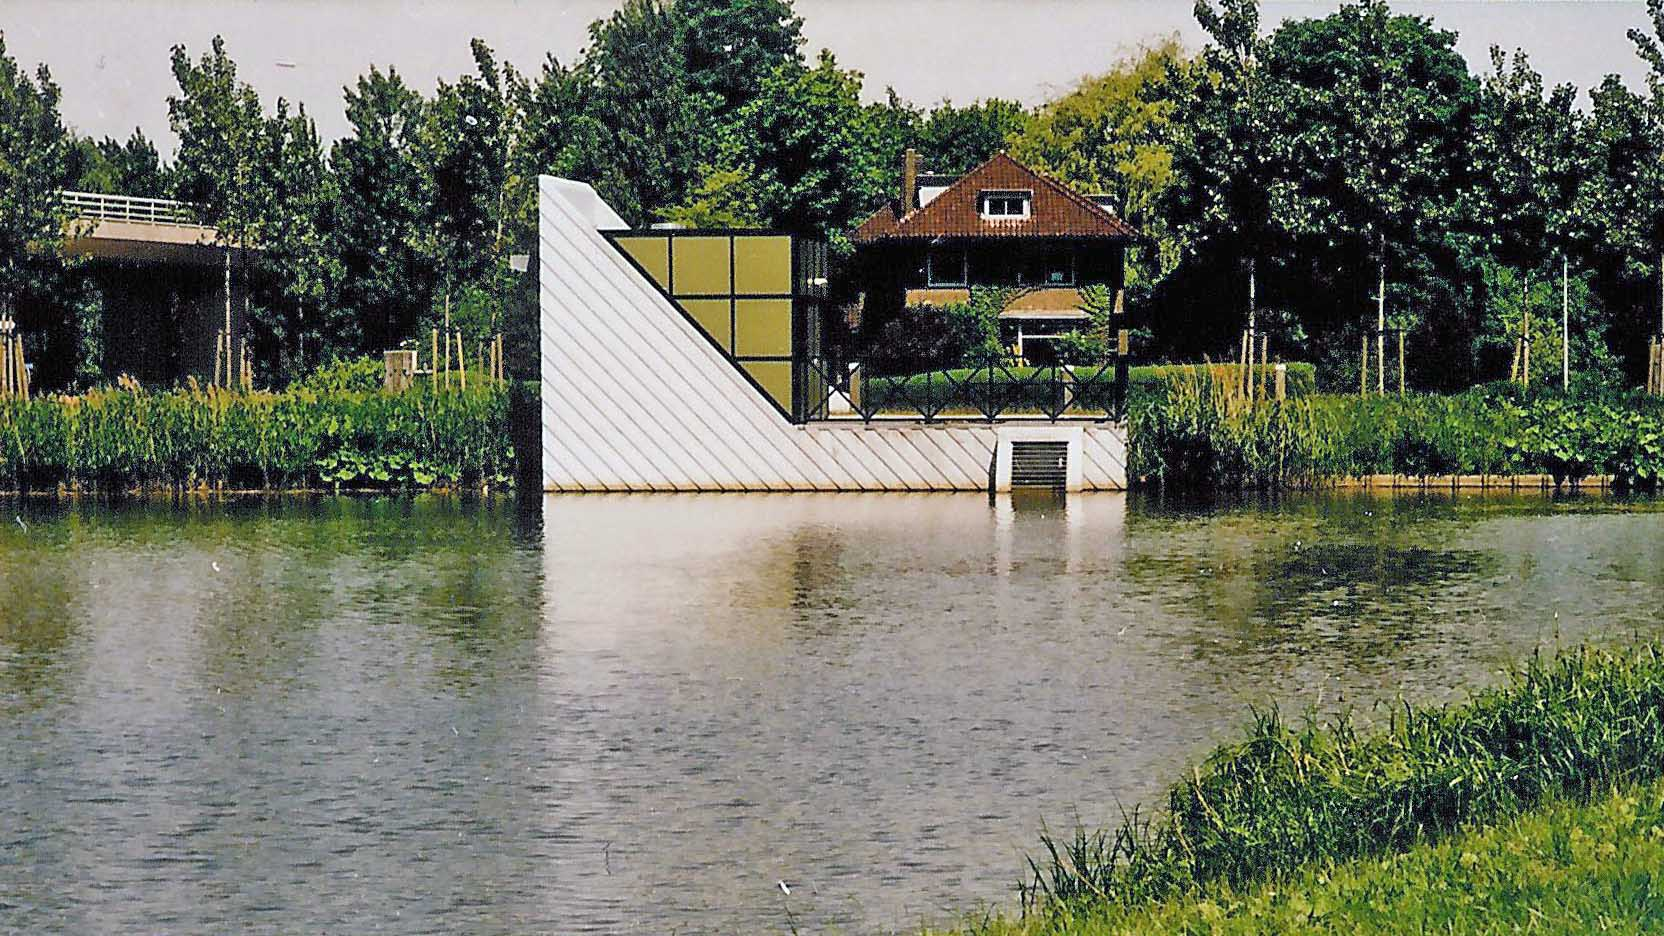 1995 combigemaal matlingeweg spaanse polder ARCHITECT MARJA HARING